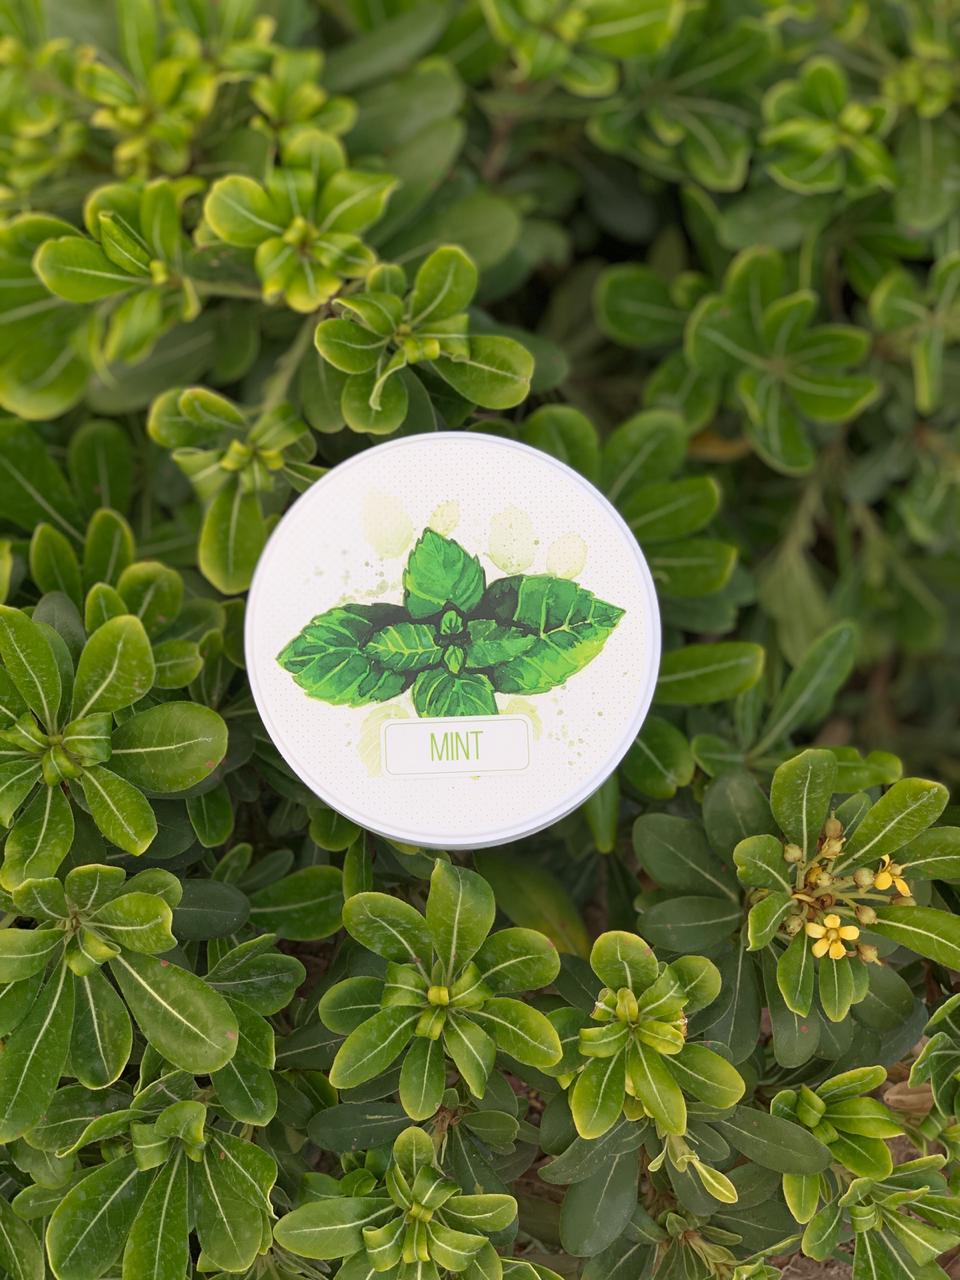 Mint scrub package design